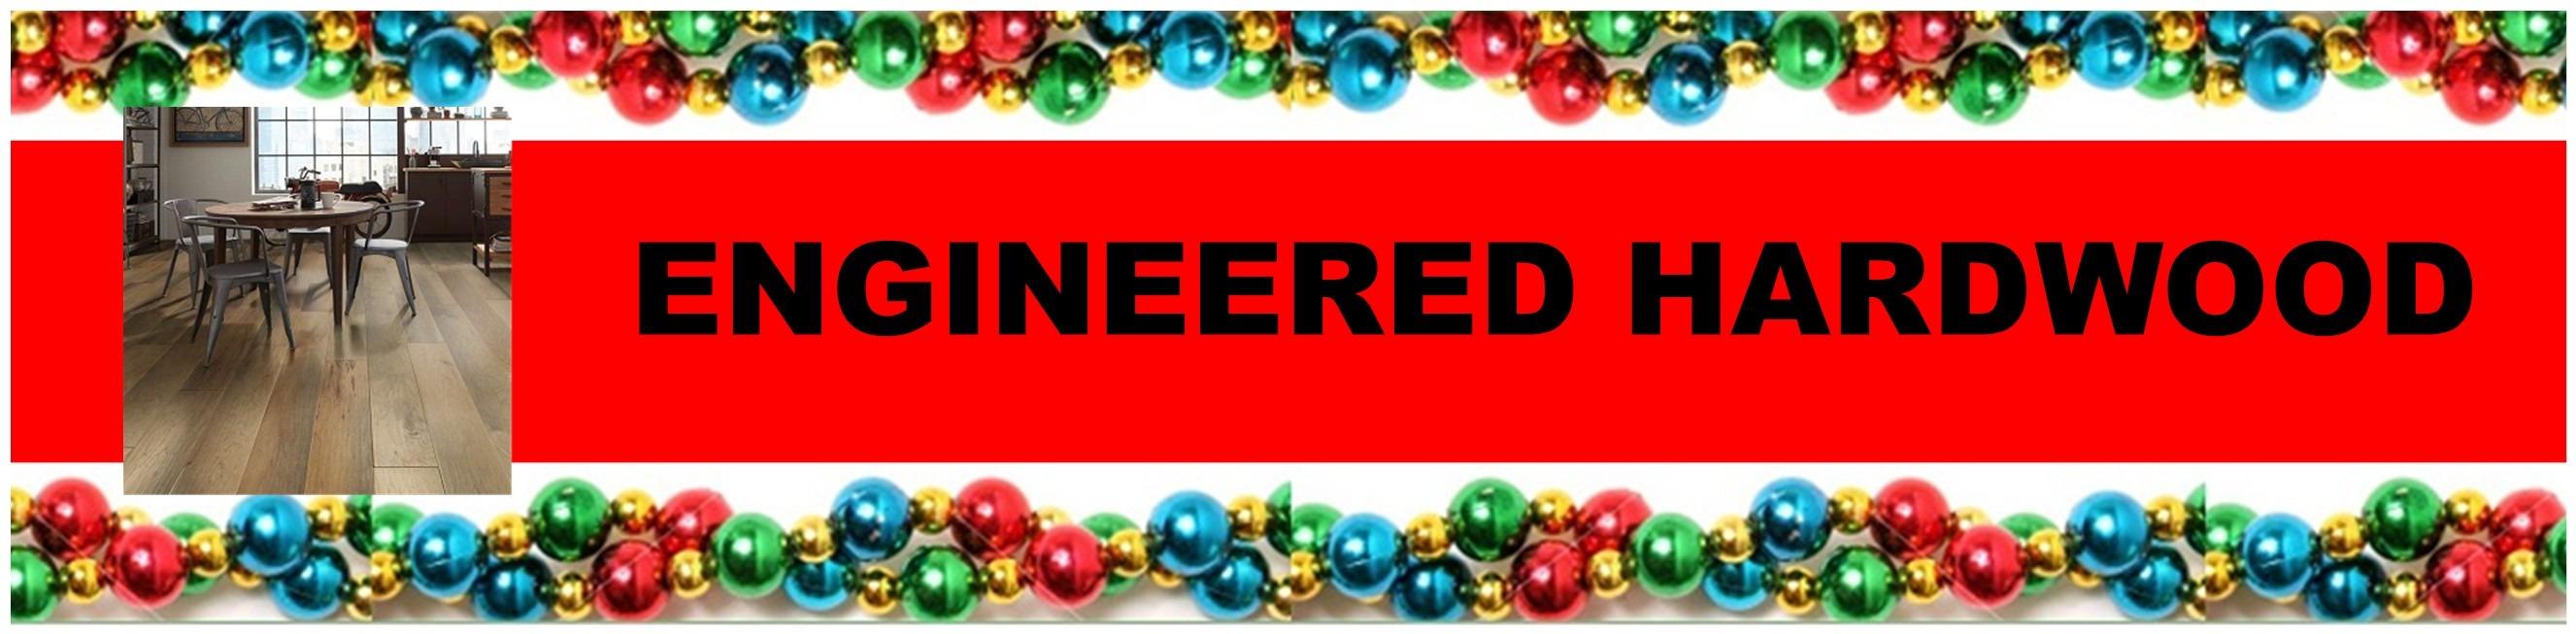 CHRISTMAS HARDWOOD HEADER